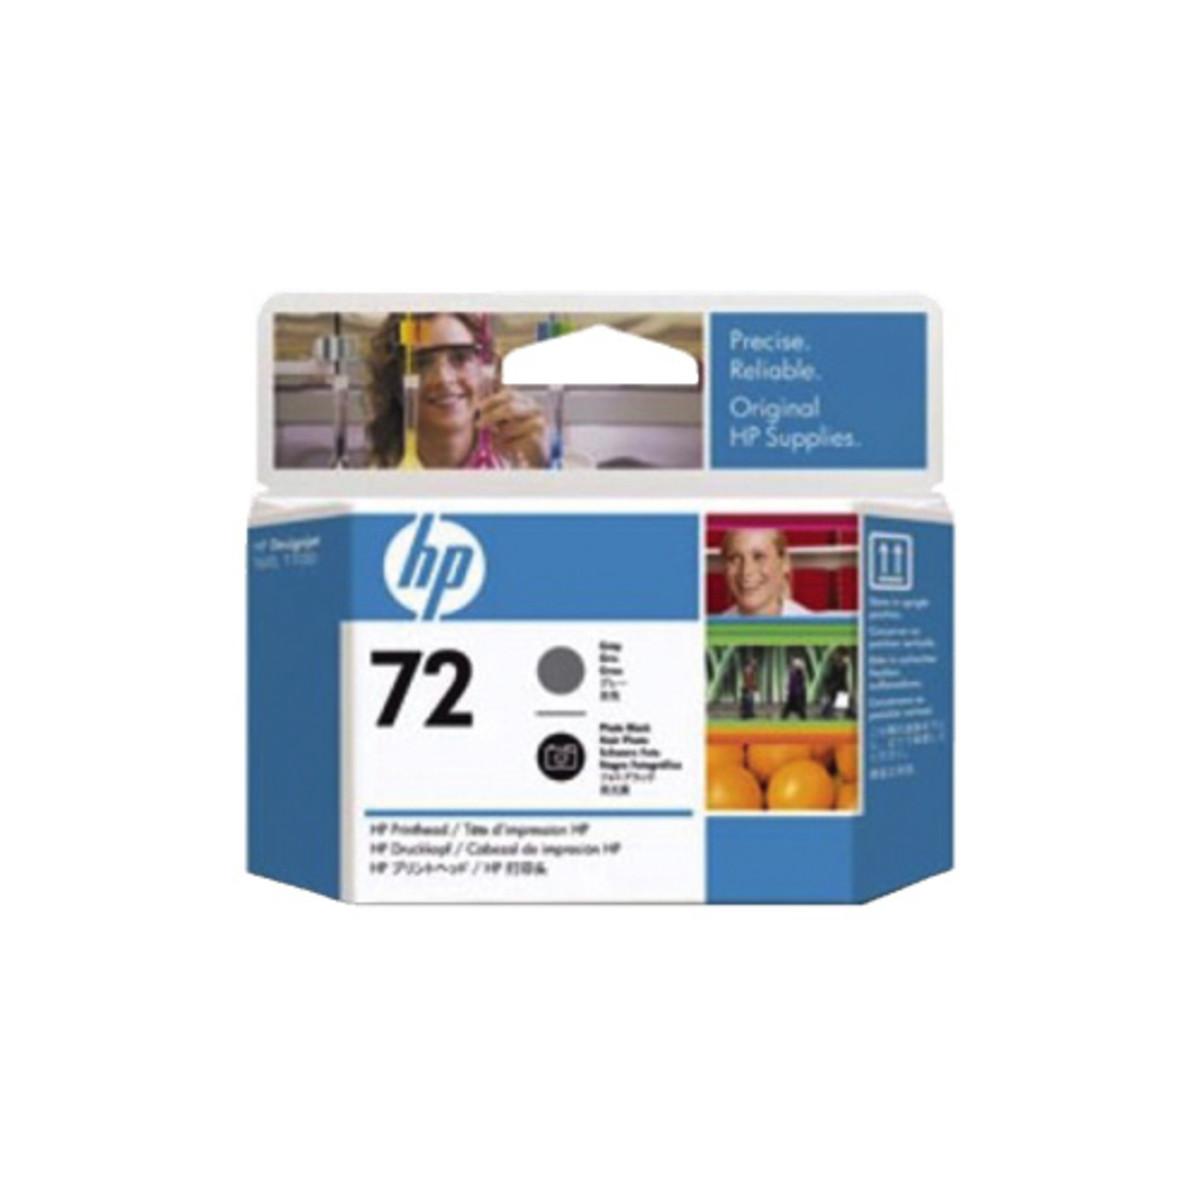 HP 72 (C9380A) Grey / Photo Black Print Head